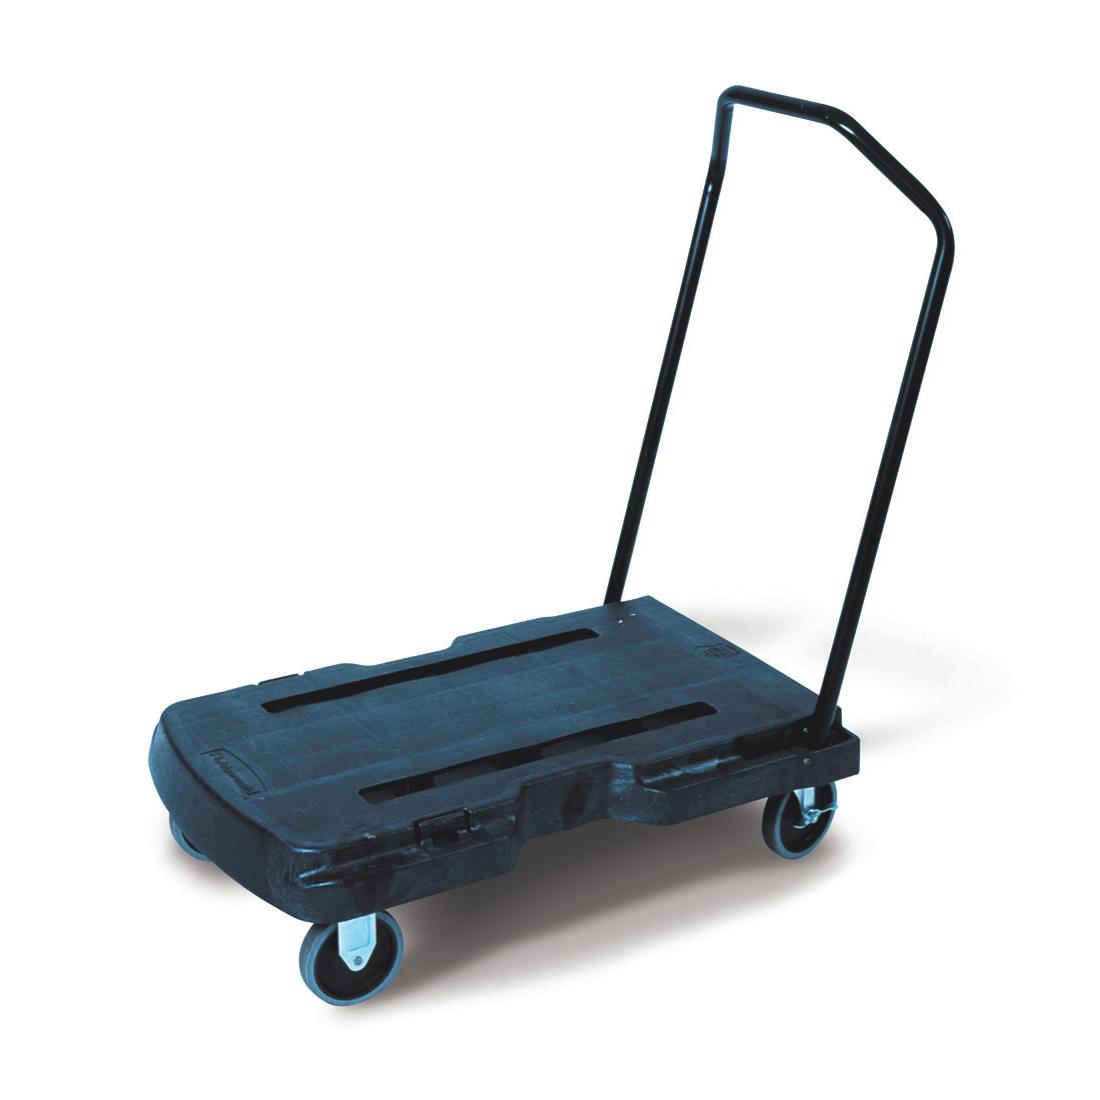 Carts Rubbermaid Triple Platform Truck with Castors 2 Fixed 2 Swivel Capacity 180kg L826xW521mm Ref 4401